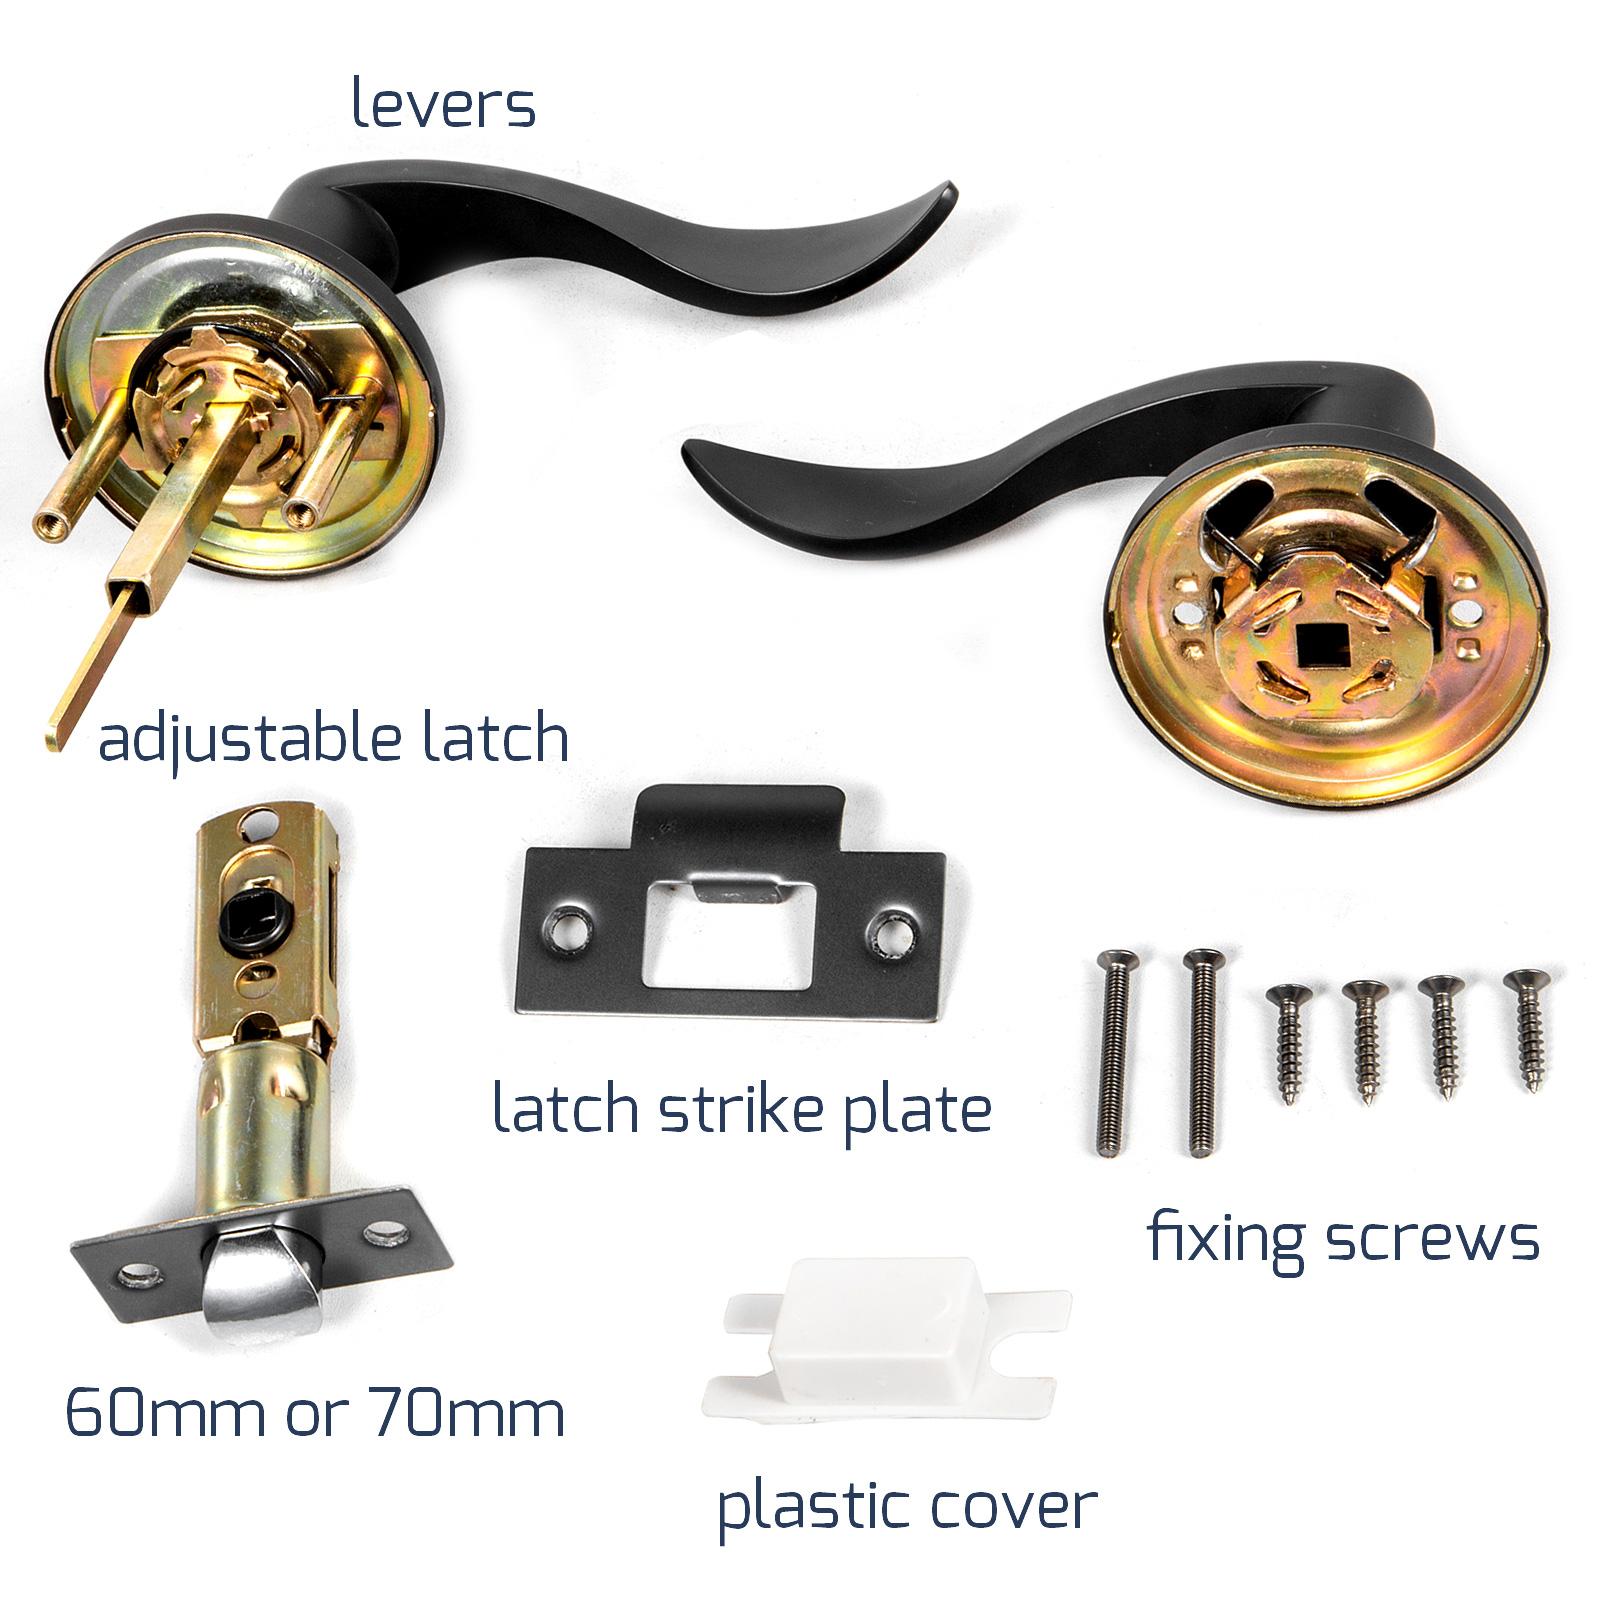 Door-Handles-Matte-Black-Door-Lever-3-5-10-Pack-Passage-Privace-Entry-Lock-Set thumbnail 69